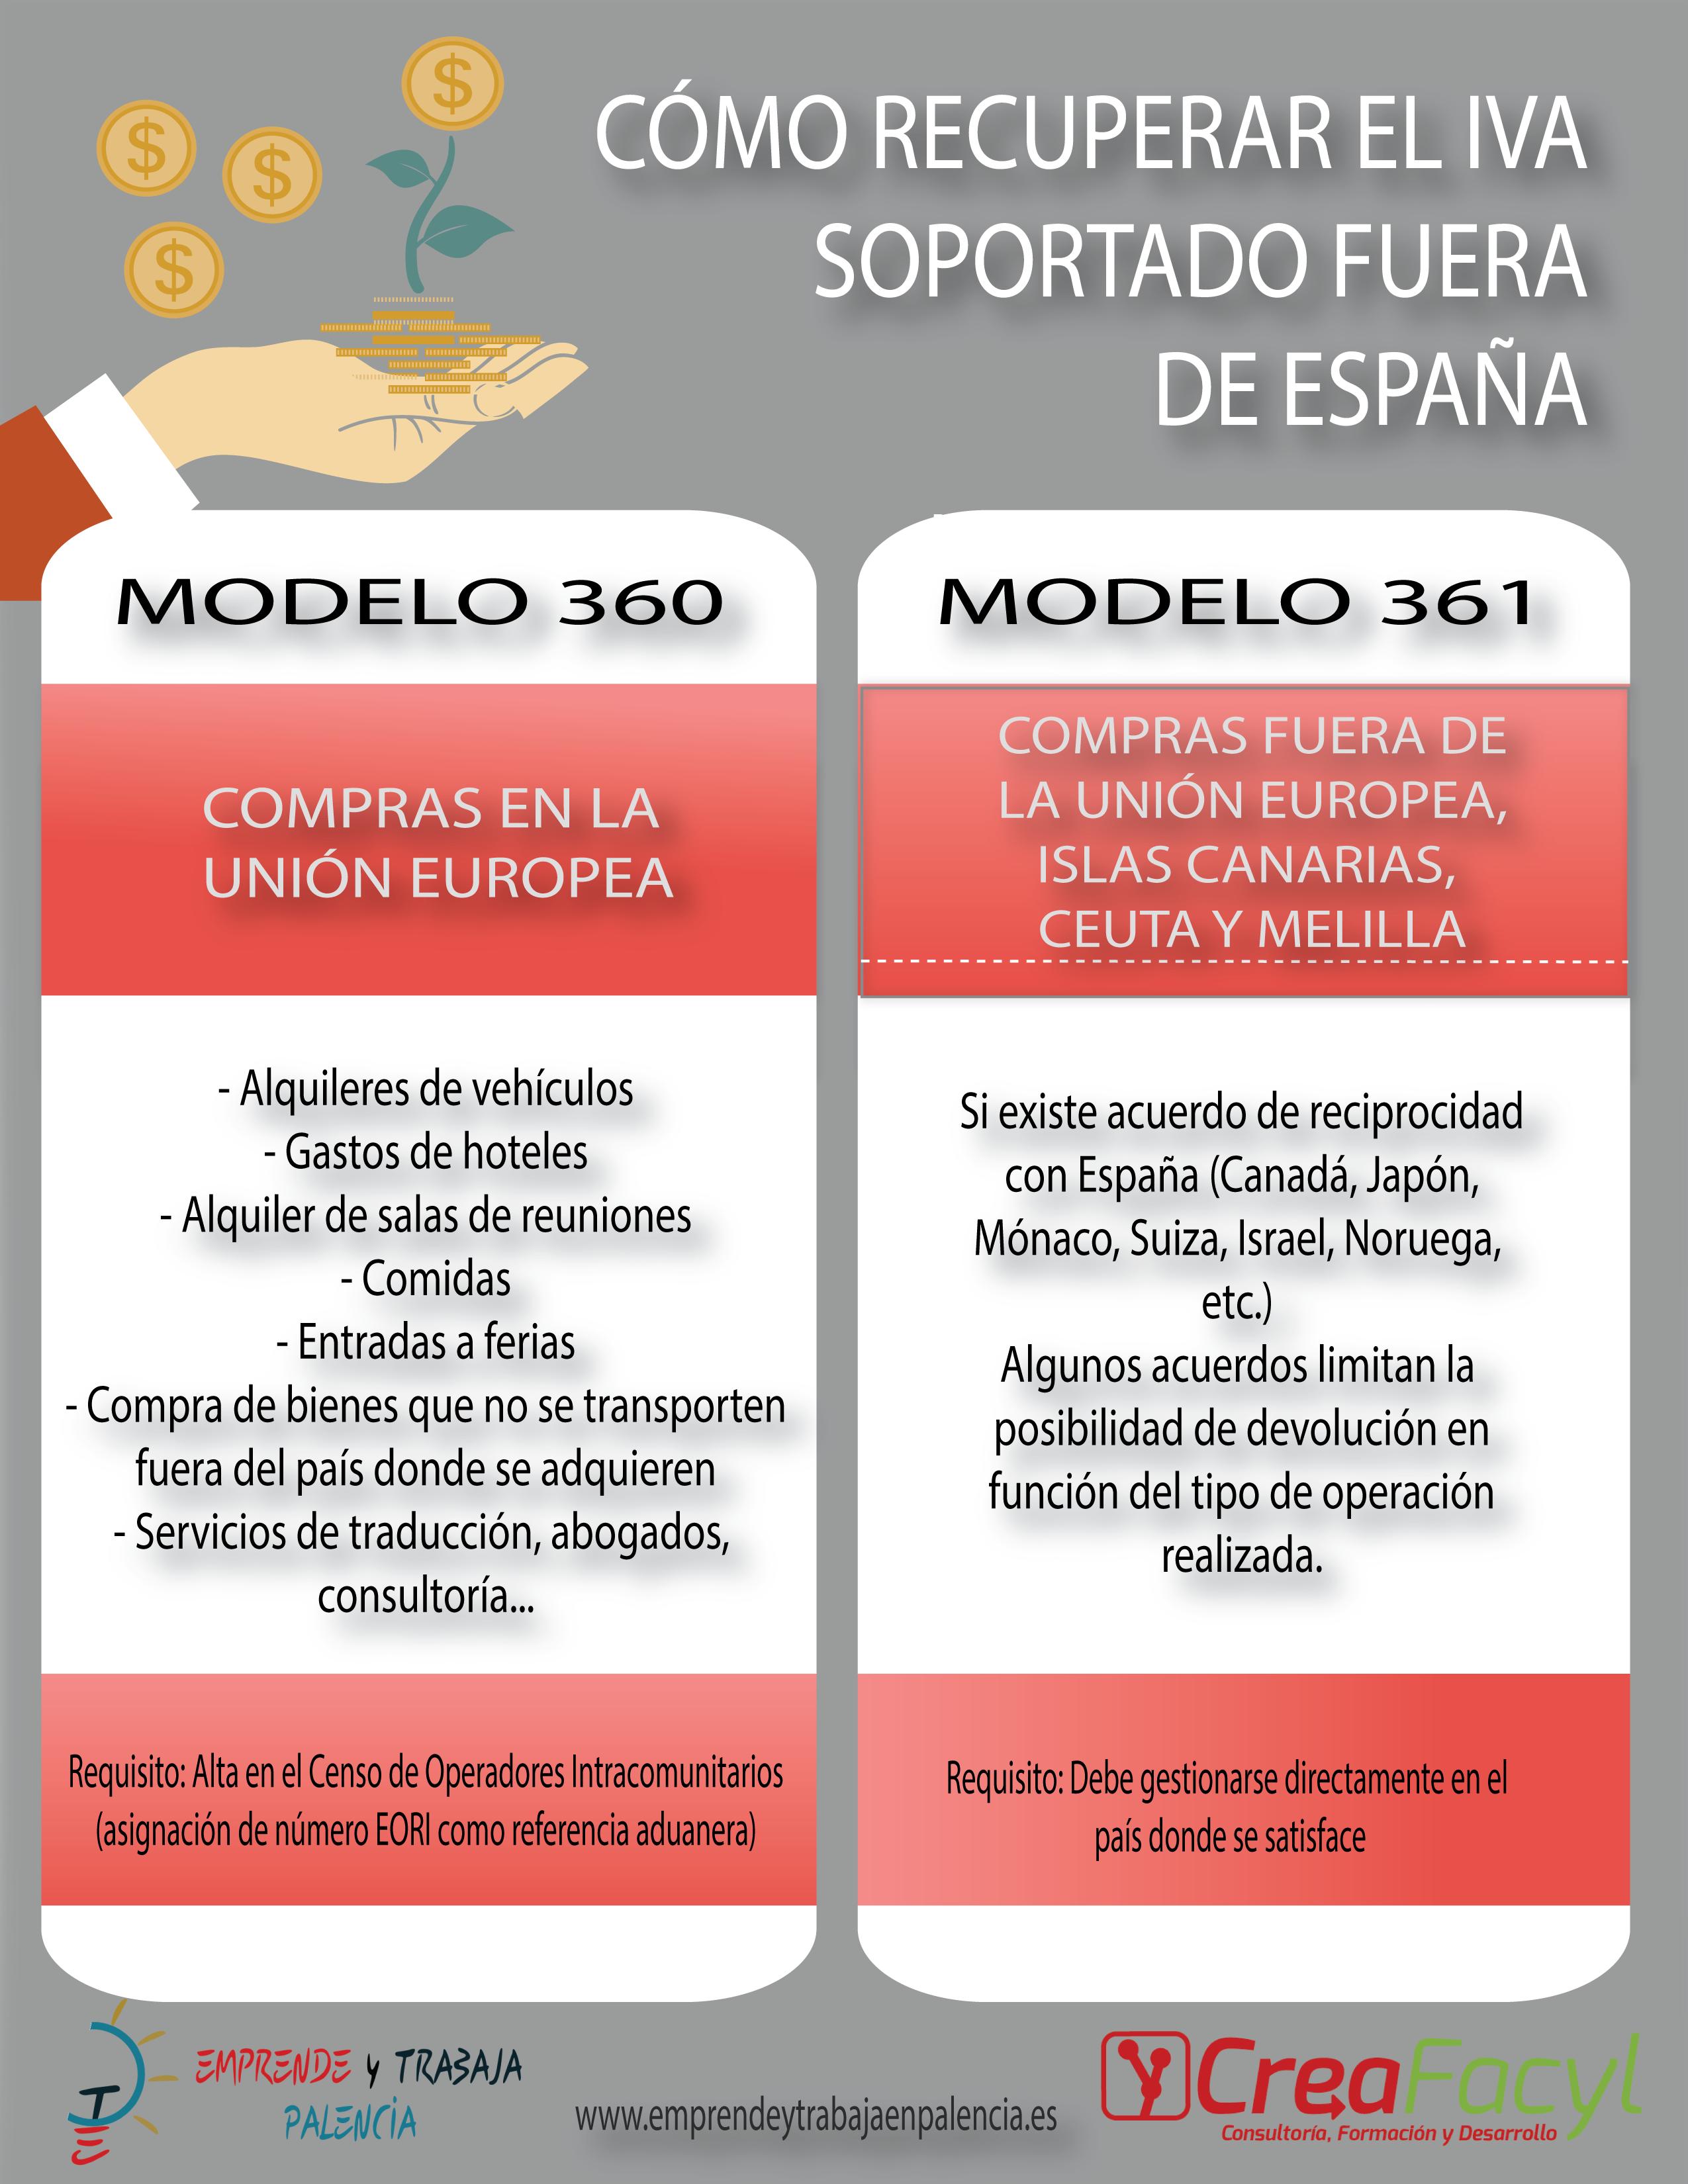 IVA_fuera_espaa-01 Creafacyl